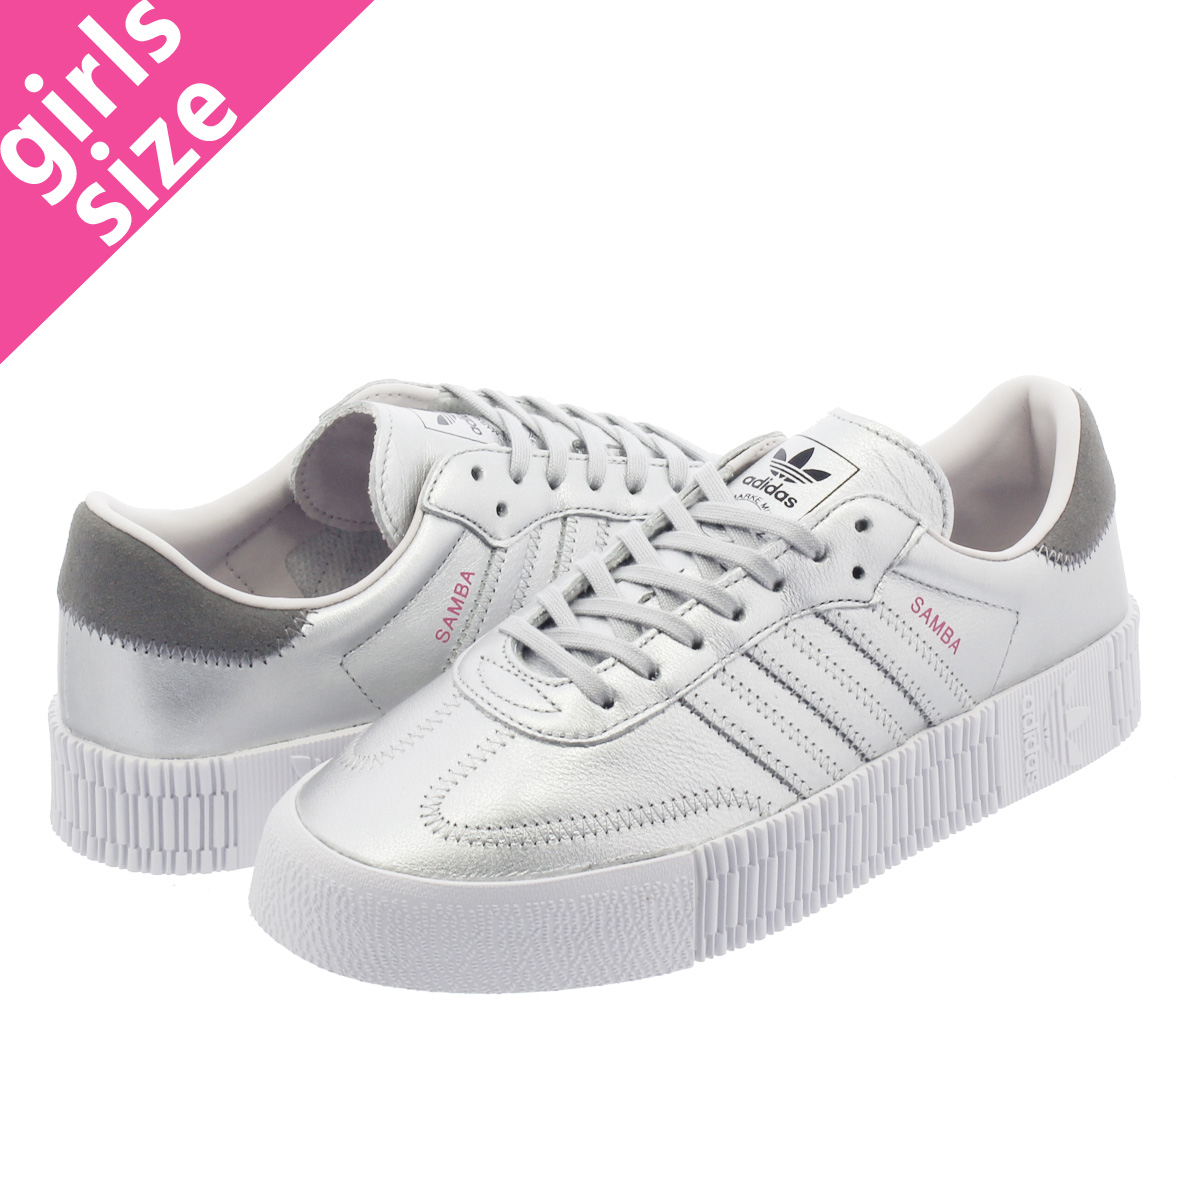 adidas SAMBAROSE W LL Adidas samba Rose W LL SILVER MET SILVER MET ORCHID  TINT d96769 b56a30197